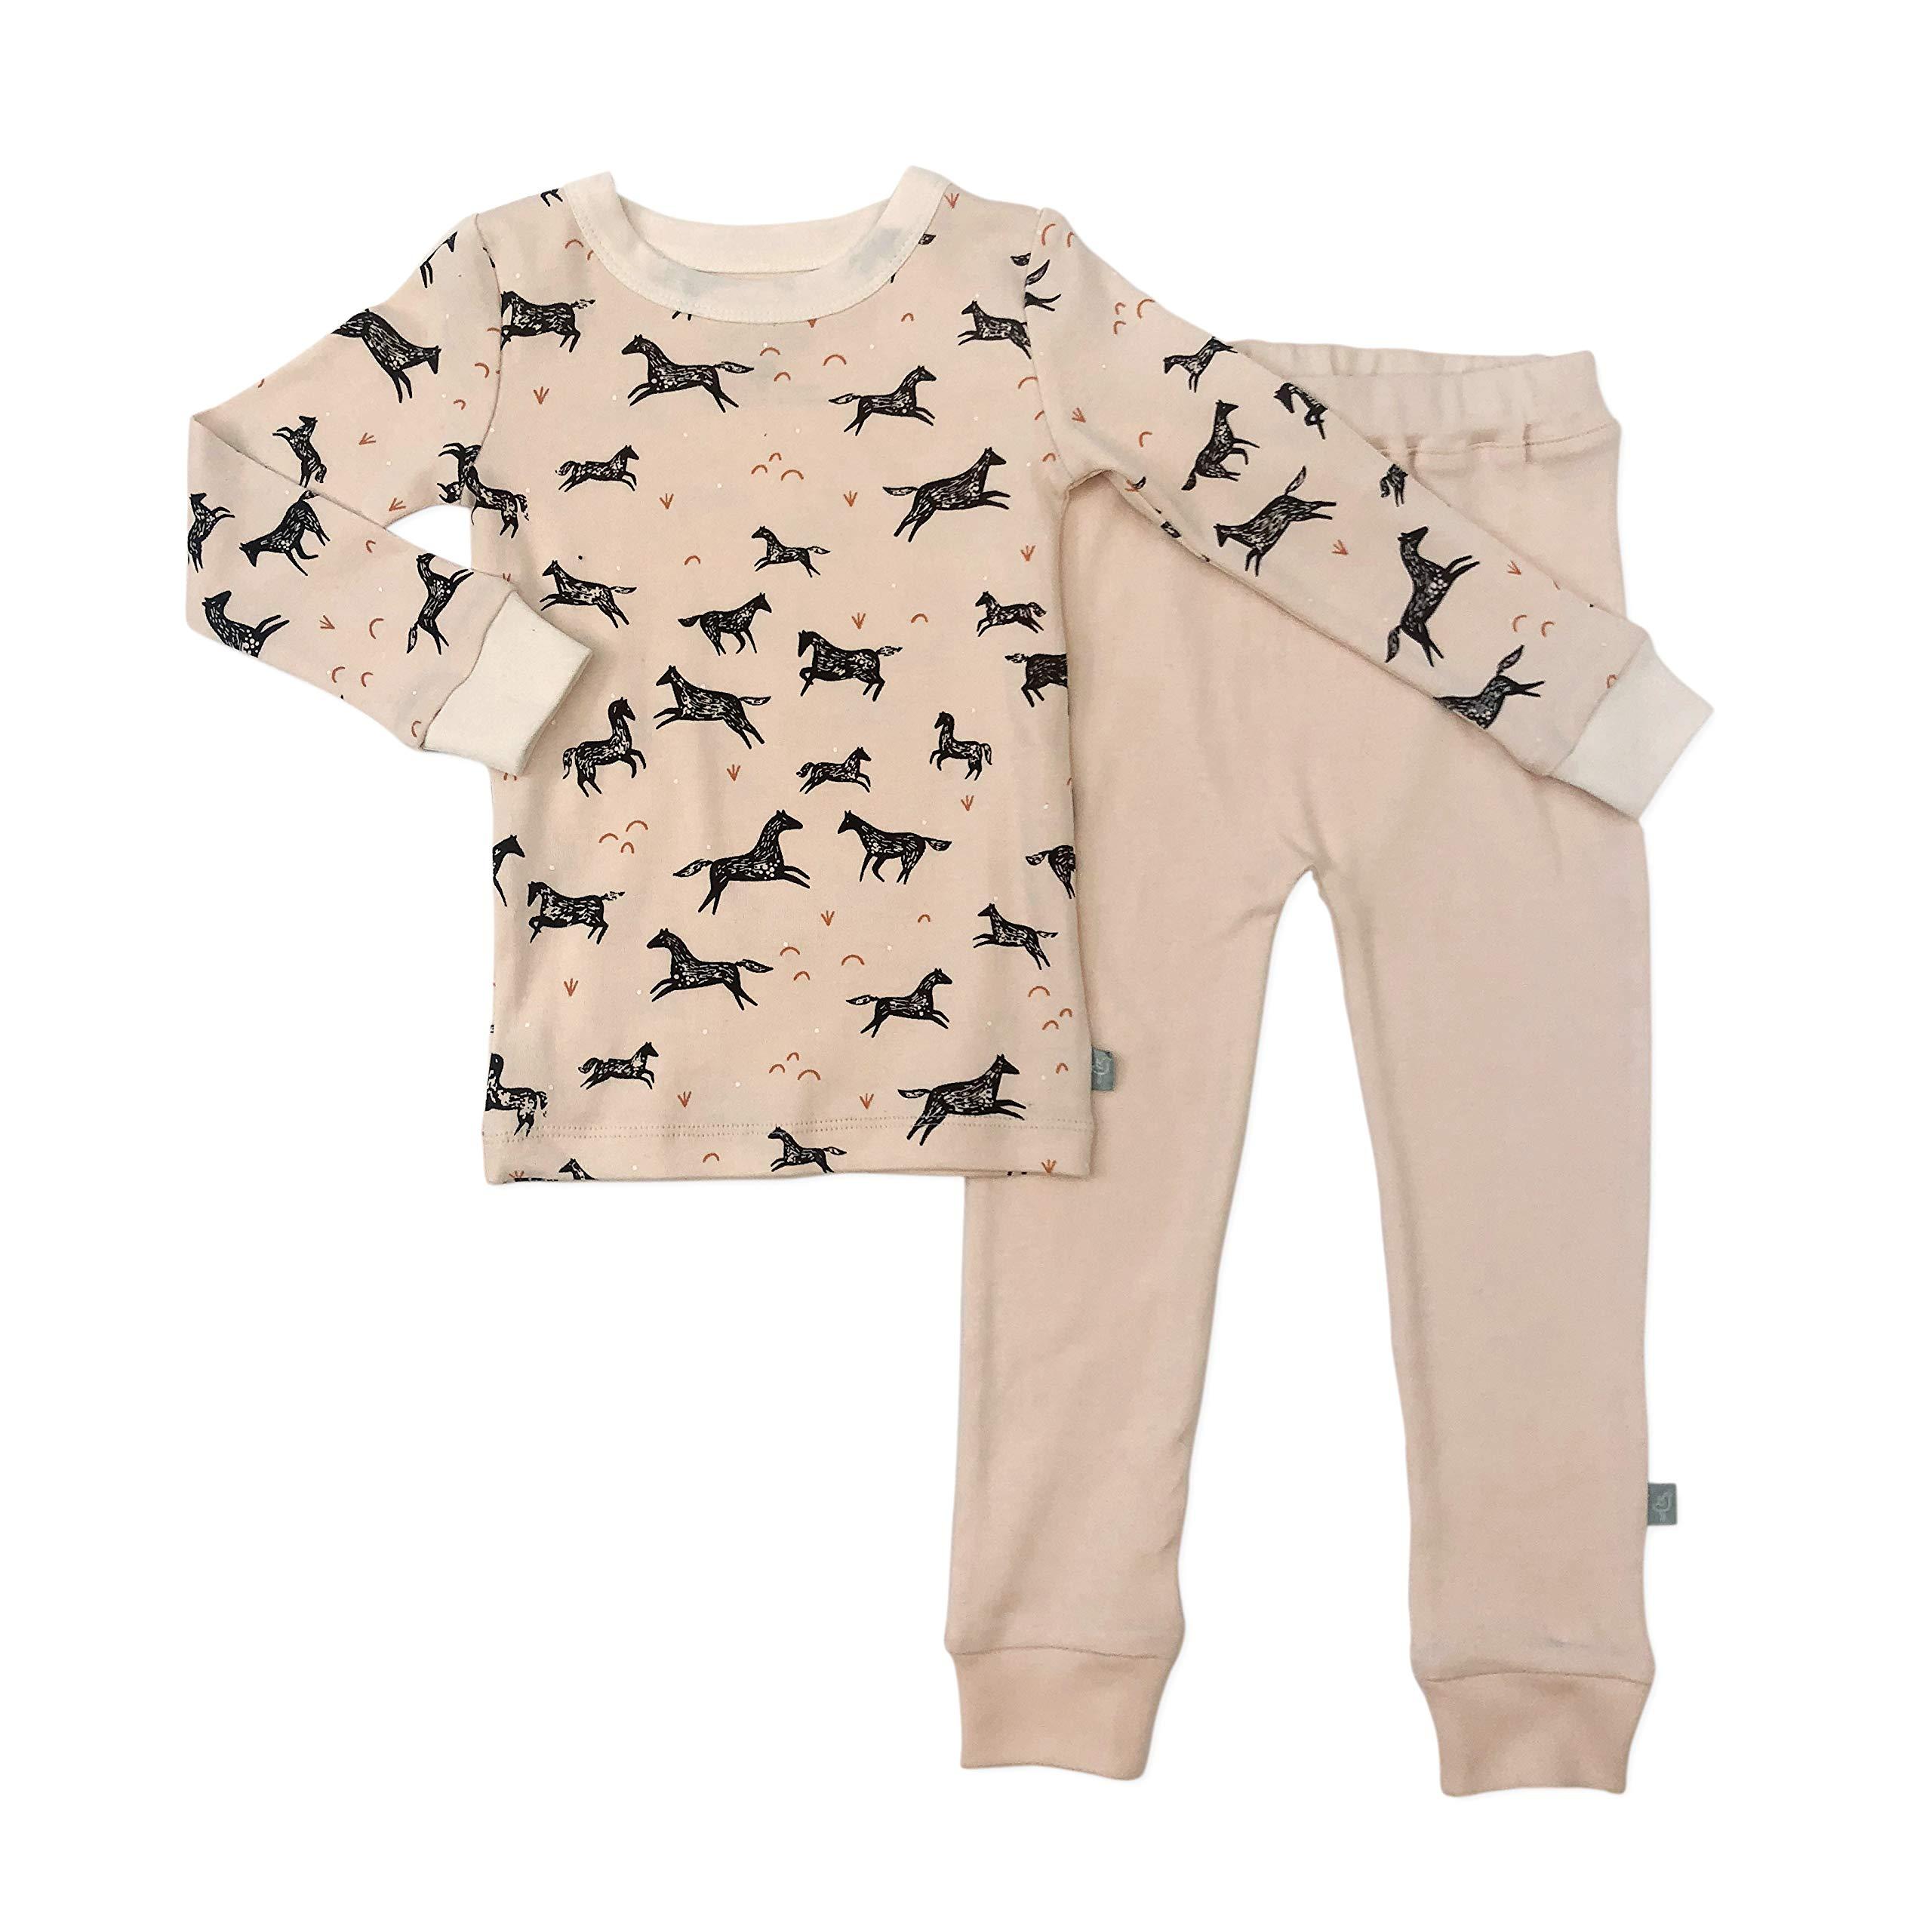 Finn + Emma Organic Cotton Pajama Sleep Set for Toddler Boy or Girl - Wild Horses, 2T by Finn + Emma